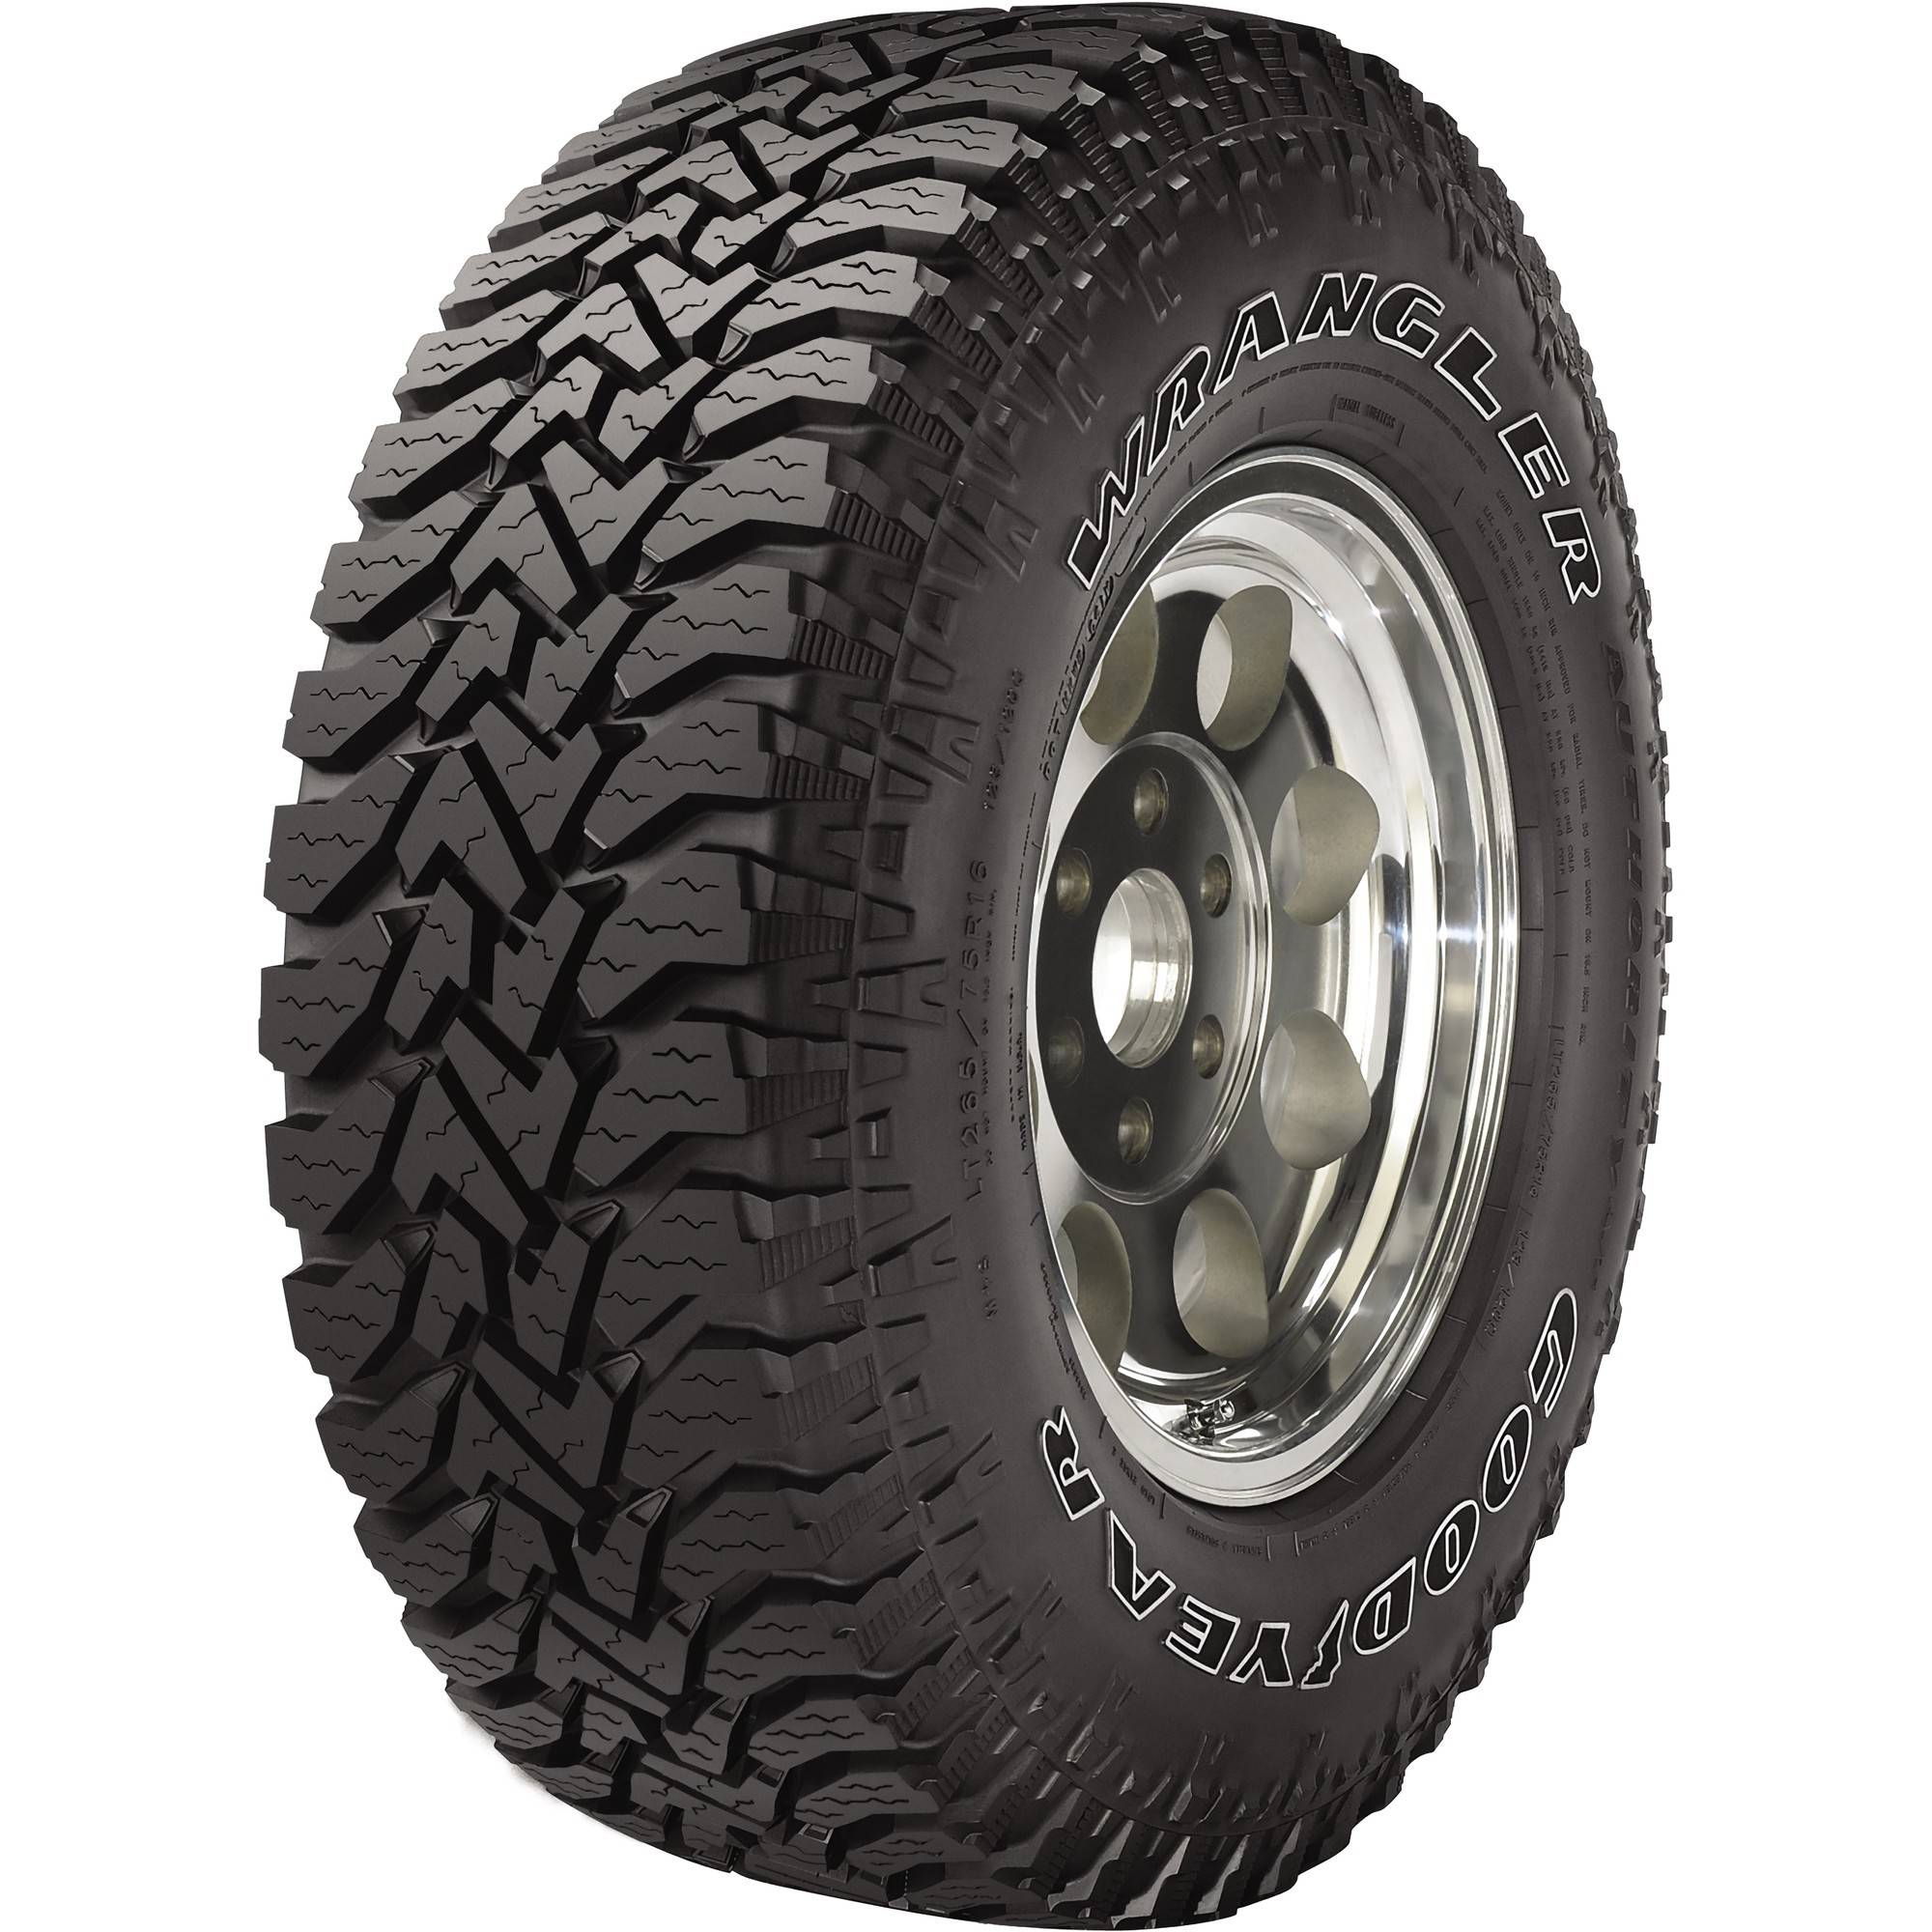 Goodyear Wrangler Authority Tire LT245/75R16E 120Q